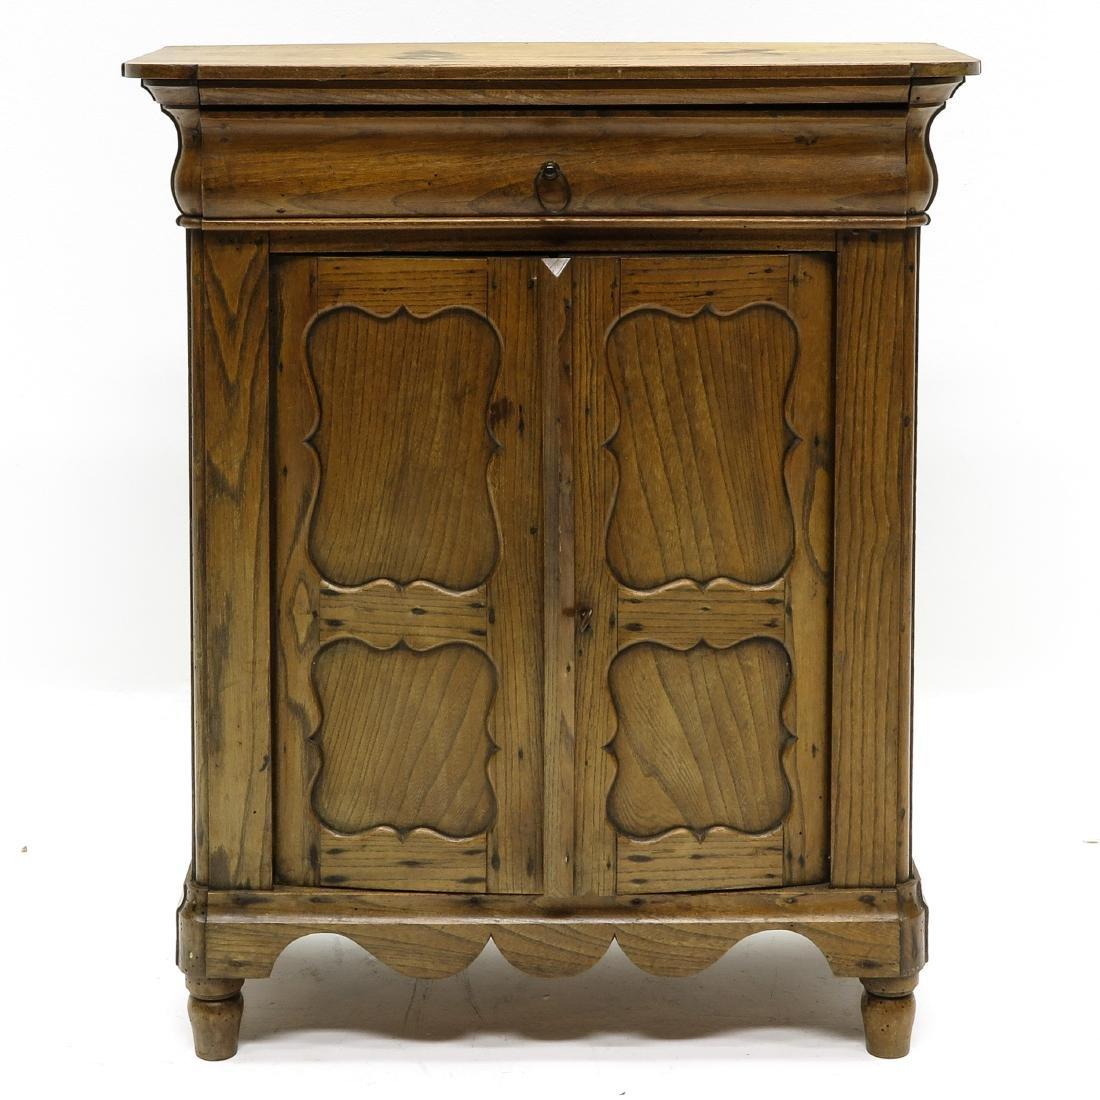 A Miniature Biedermeier Cabinet